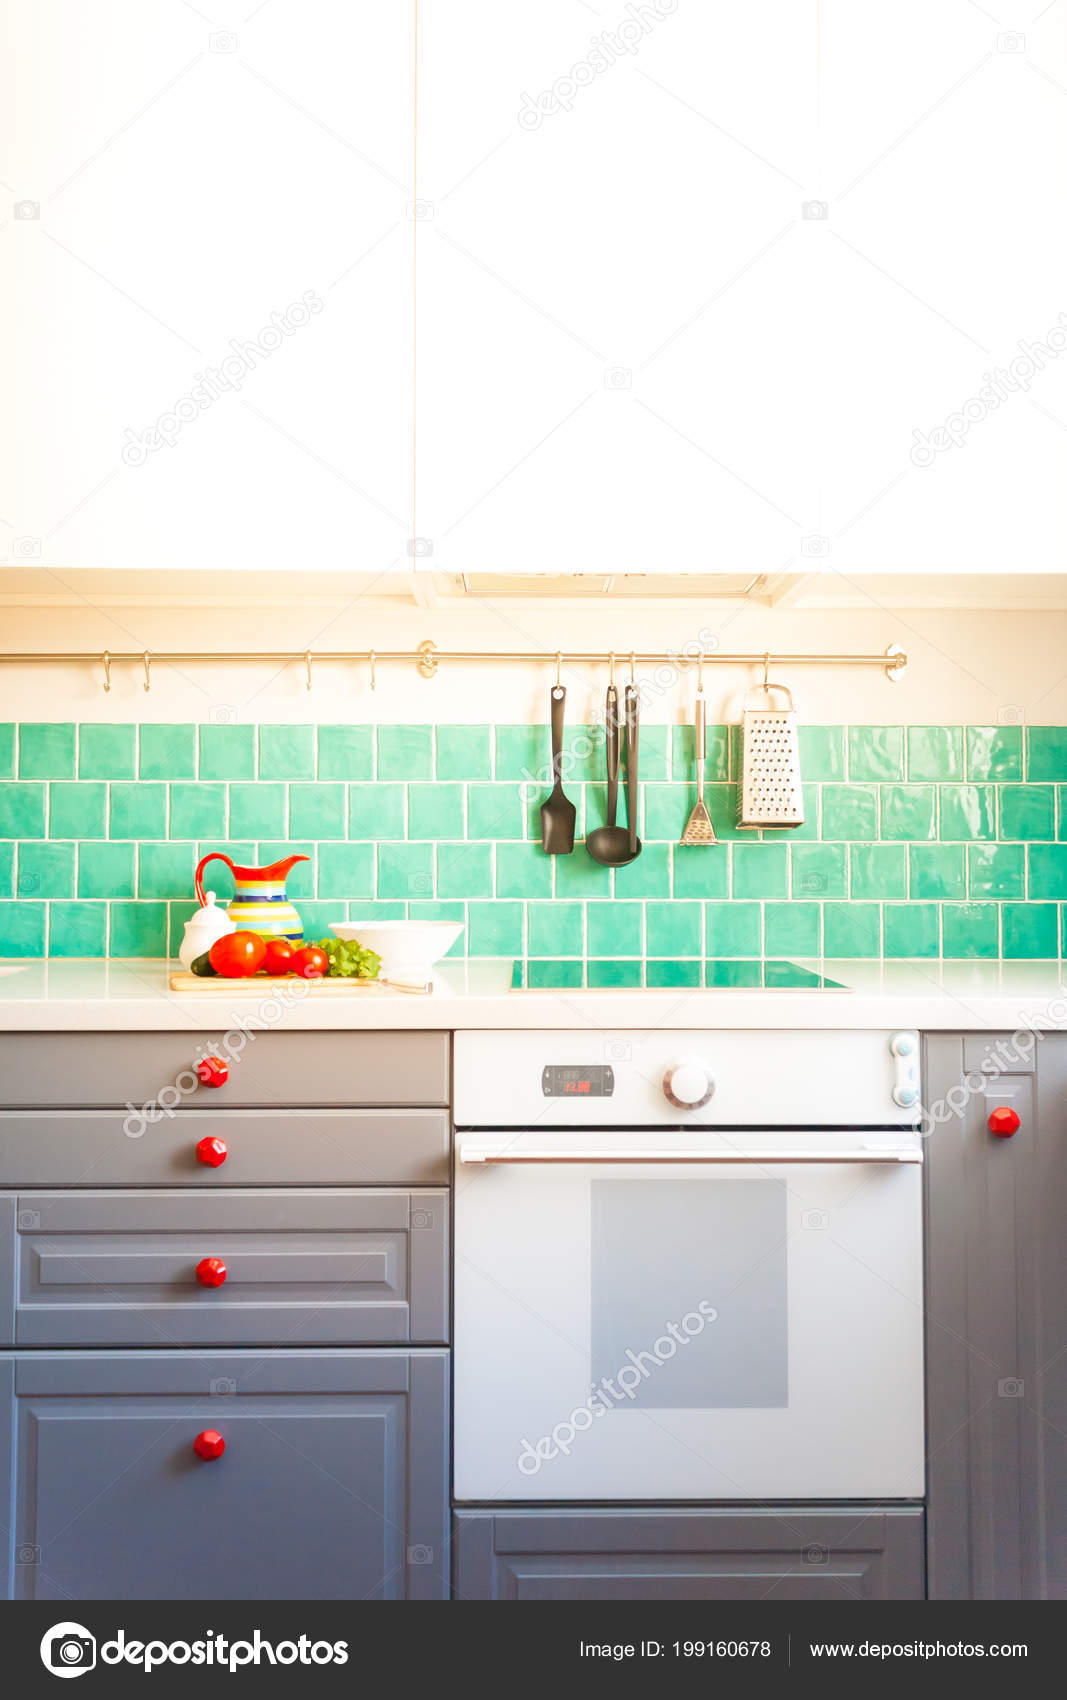 grey kitchen tile cabinets newark nj 现代灰色厨房特色深灰色扁平前柜配对白色石英台面和一个光泽的蓝色护理 现代灰色厨房特色深灰色扁平前柜配对白色石英台面和一个光泽的蓝色护理瓷砖 照片作者masalskaya